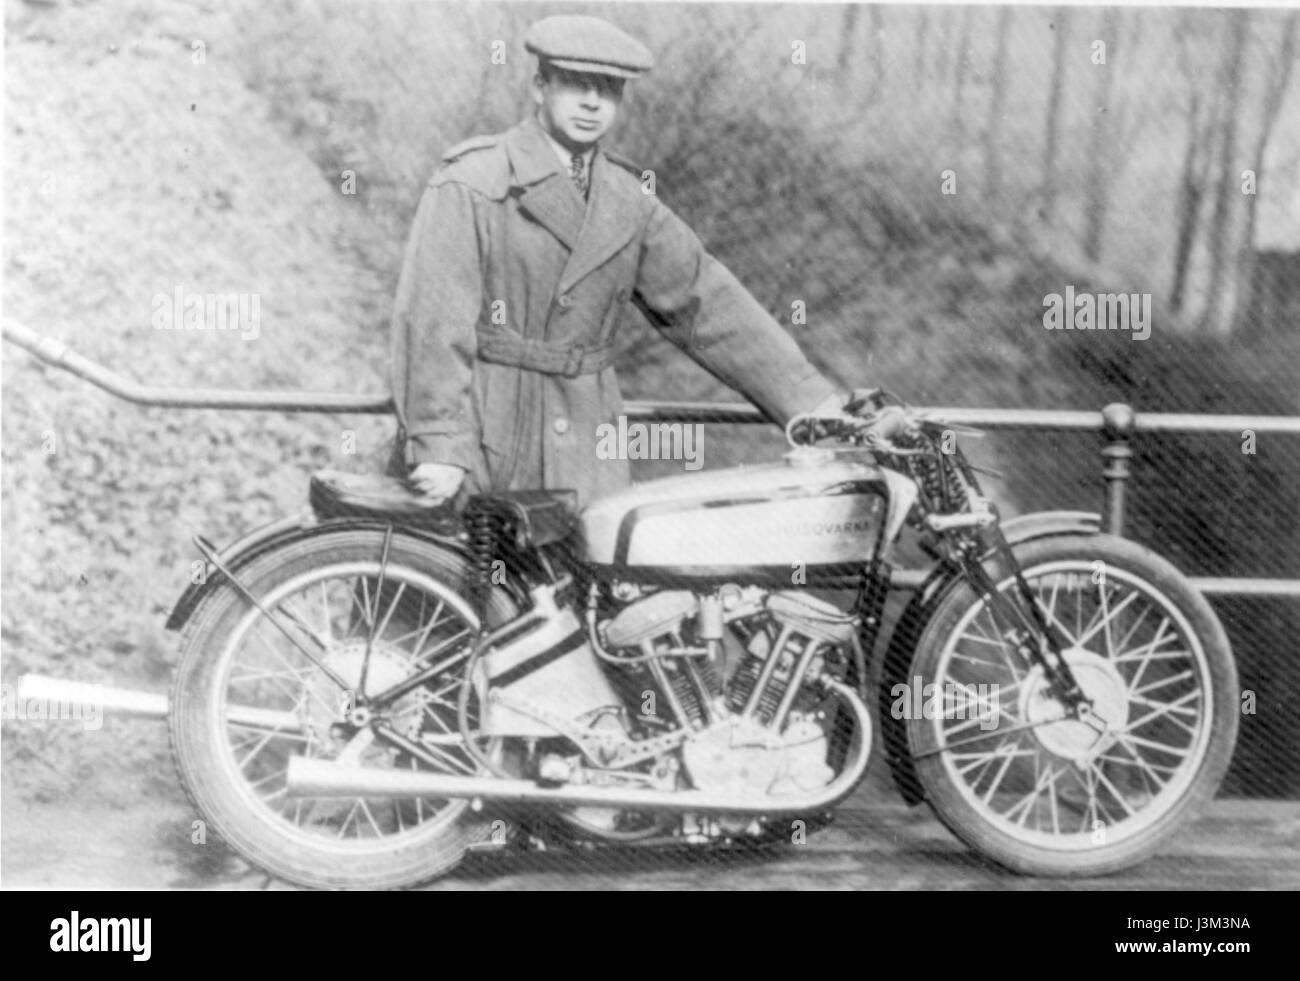 Husqvarna 500 cc racer 1935 - Stock Image